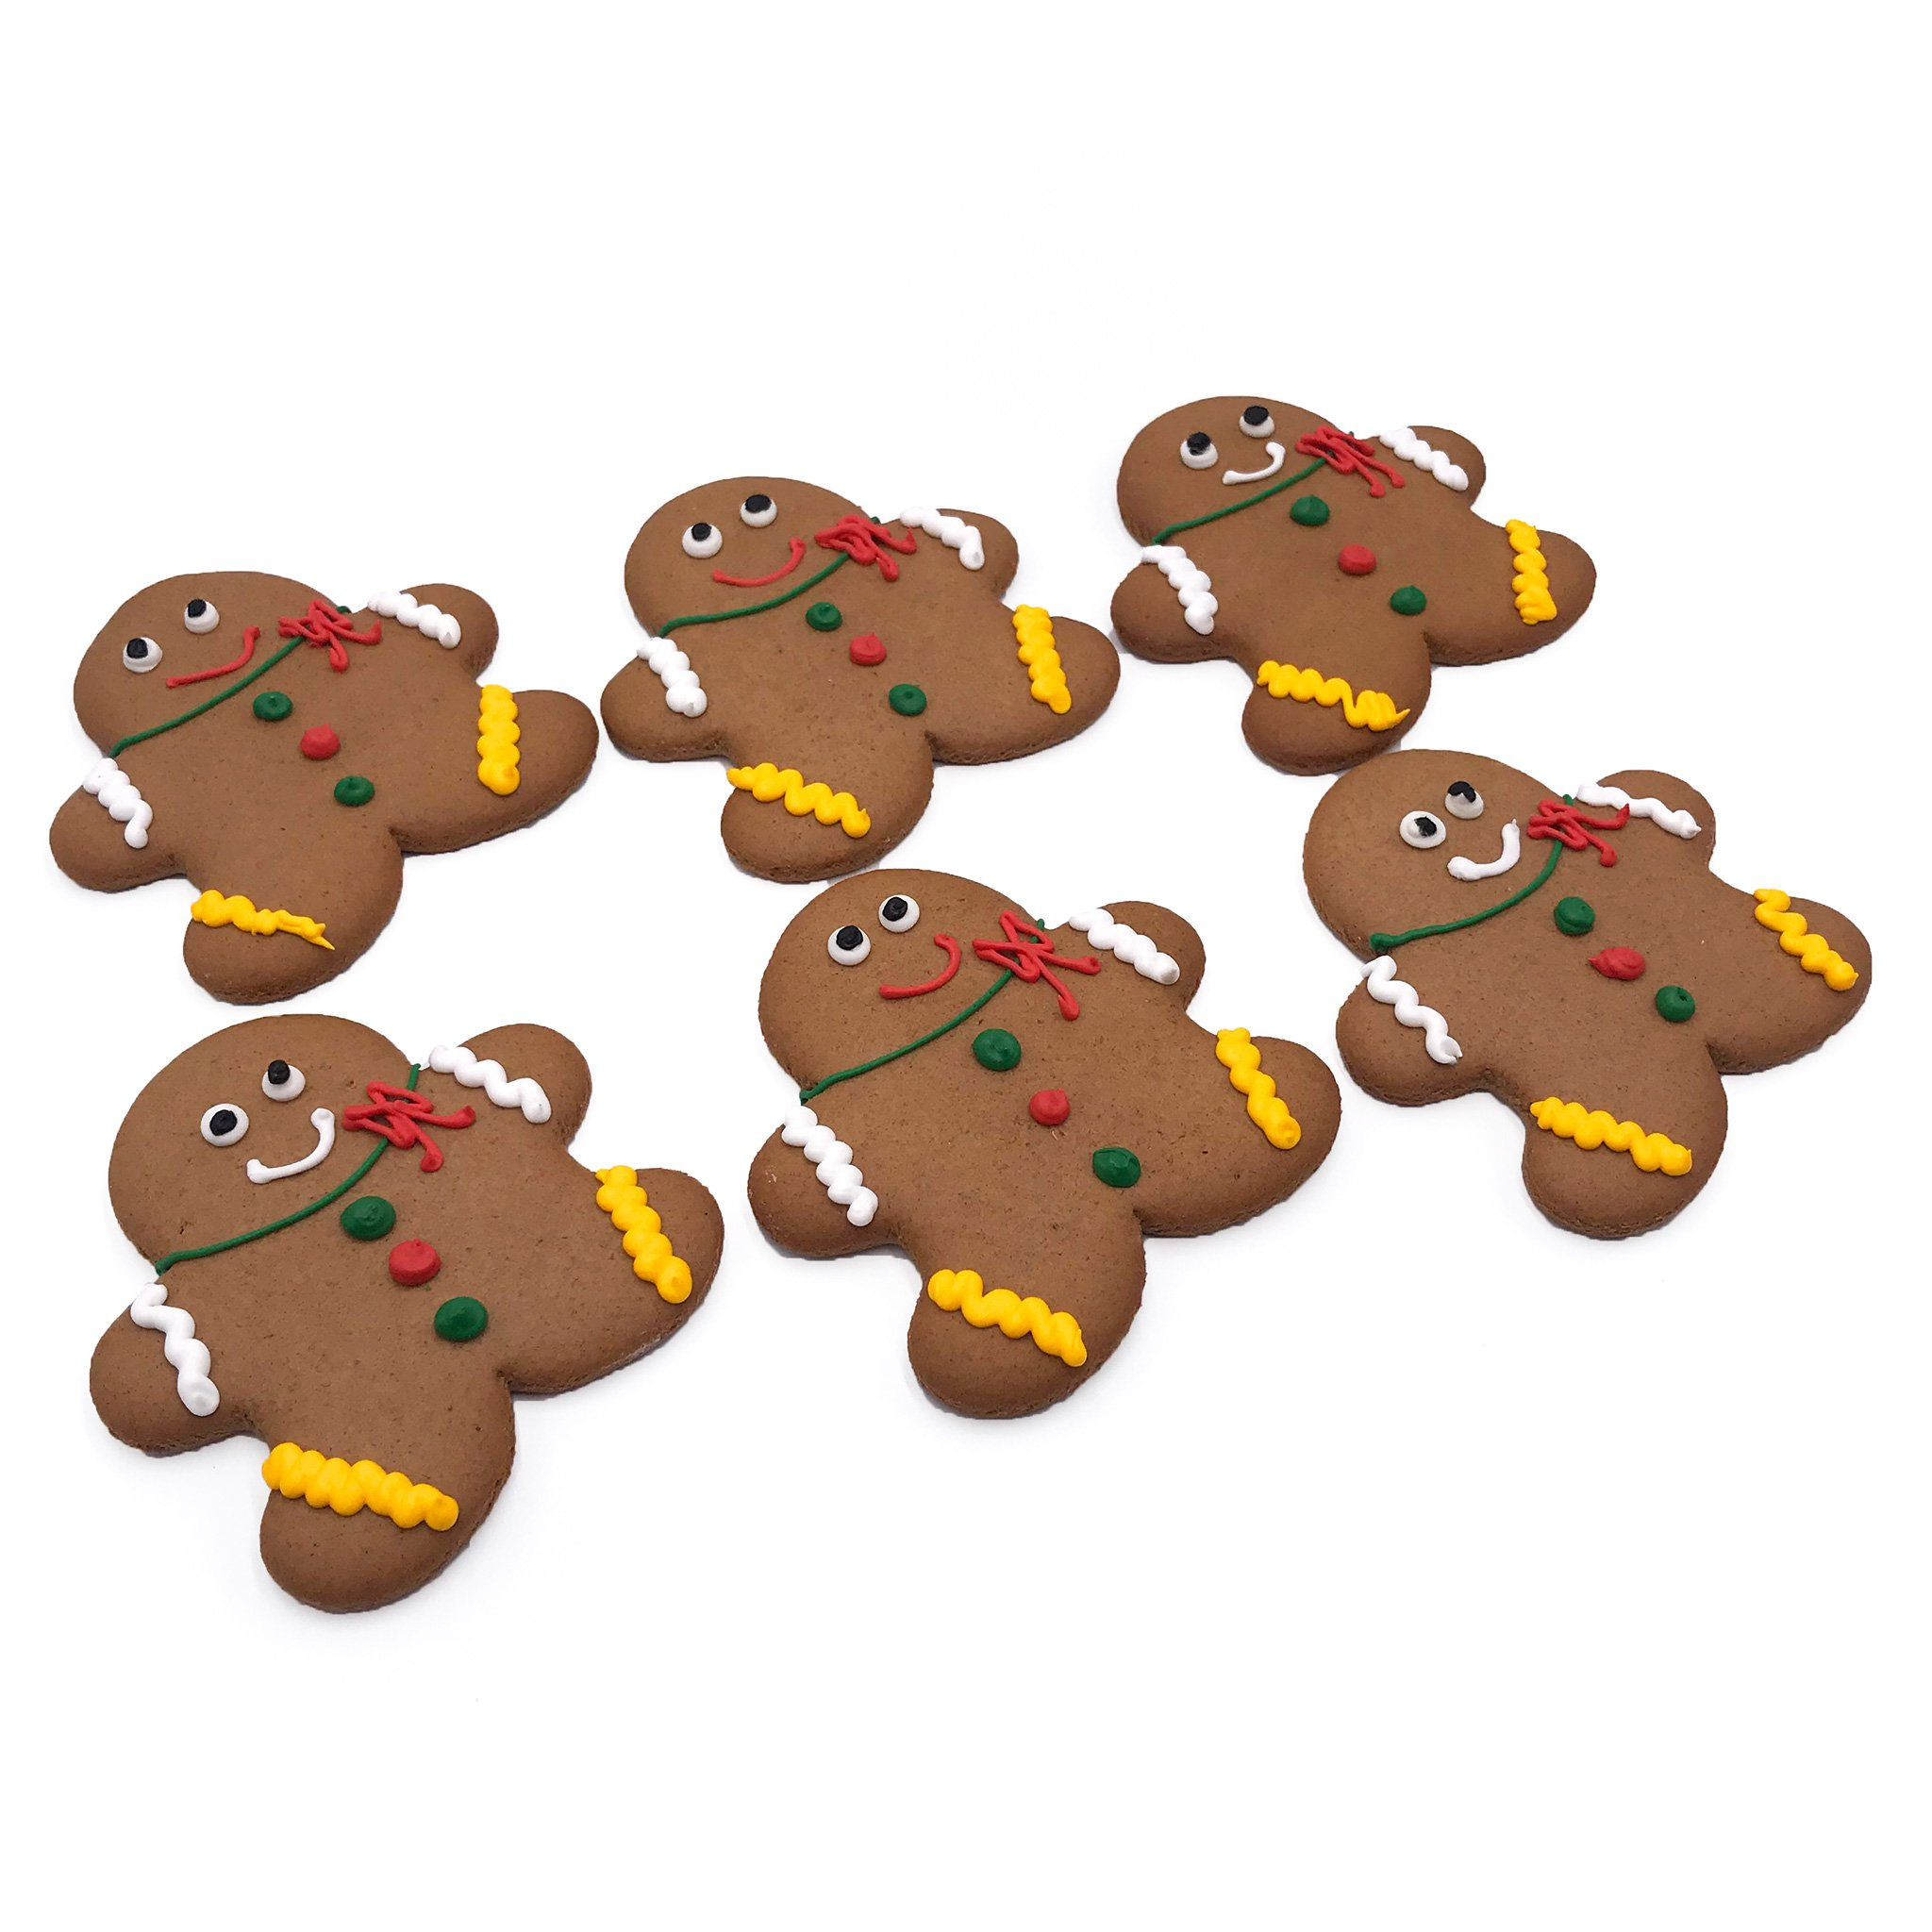 2048x2048 Gingerbread Men